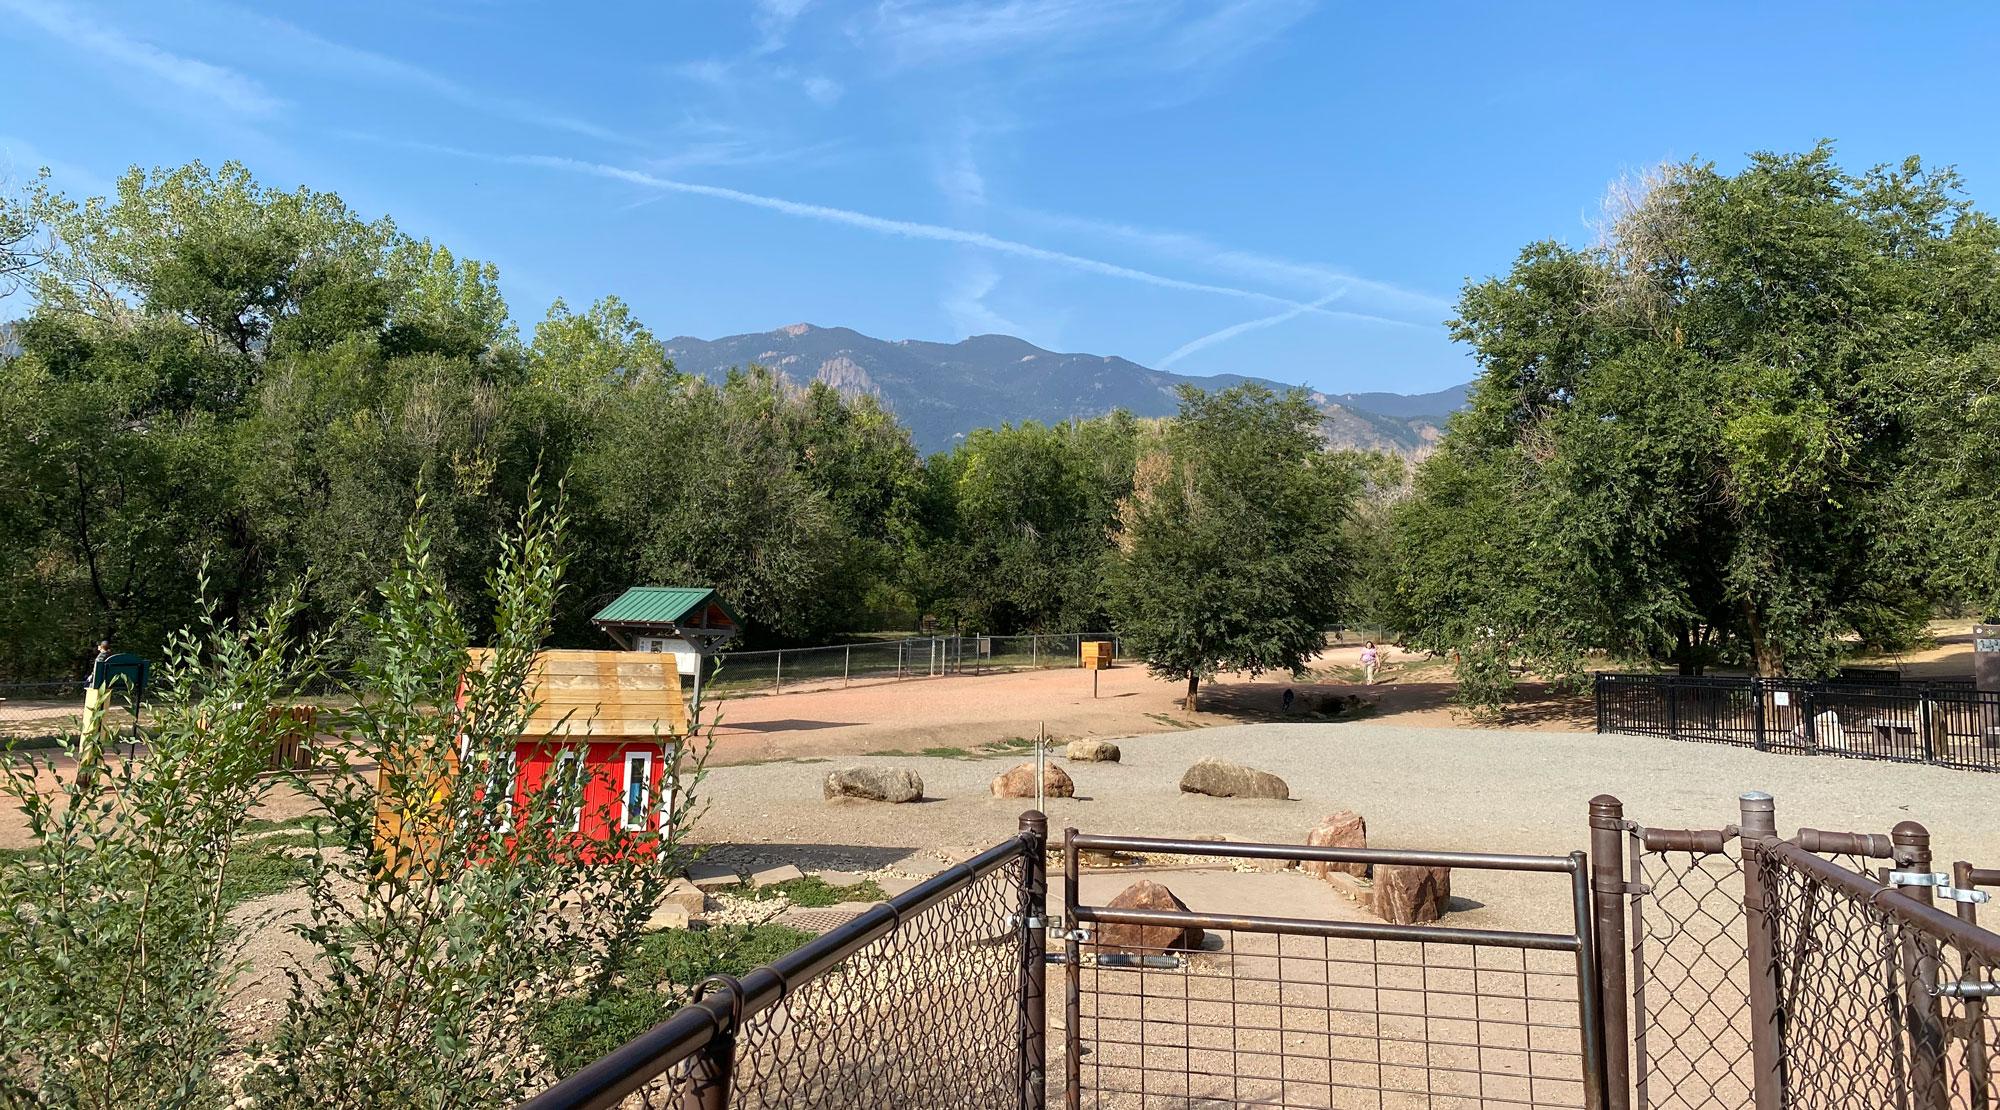 bear creek dog park, the largest of colorado springs dog parks